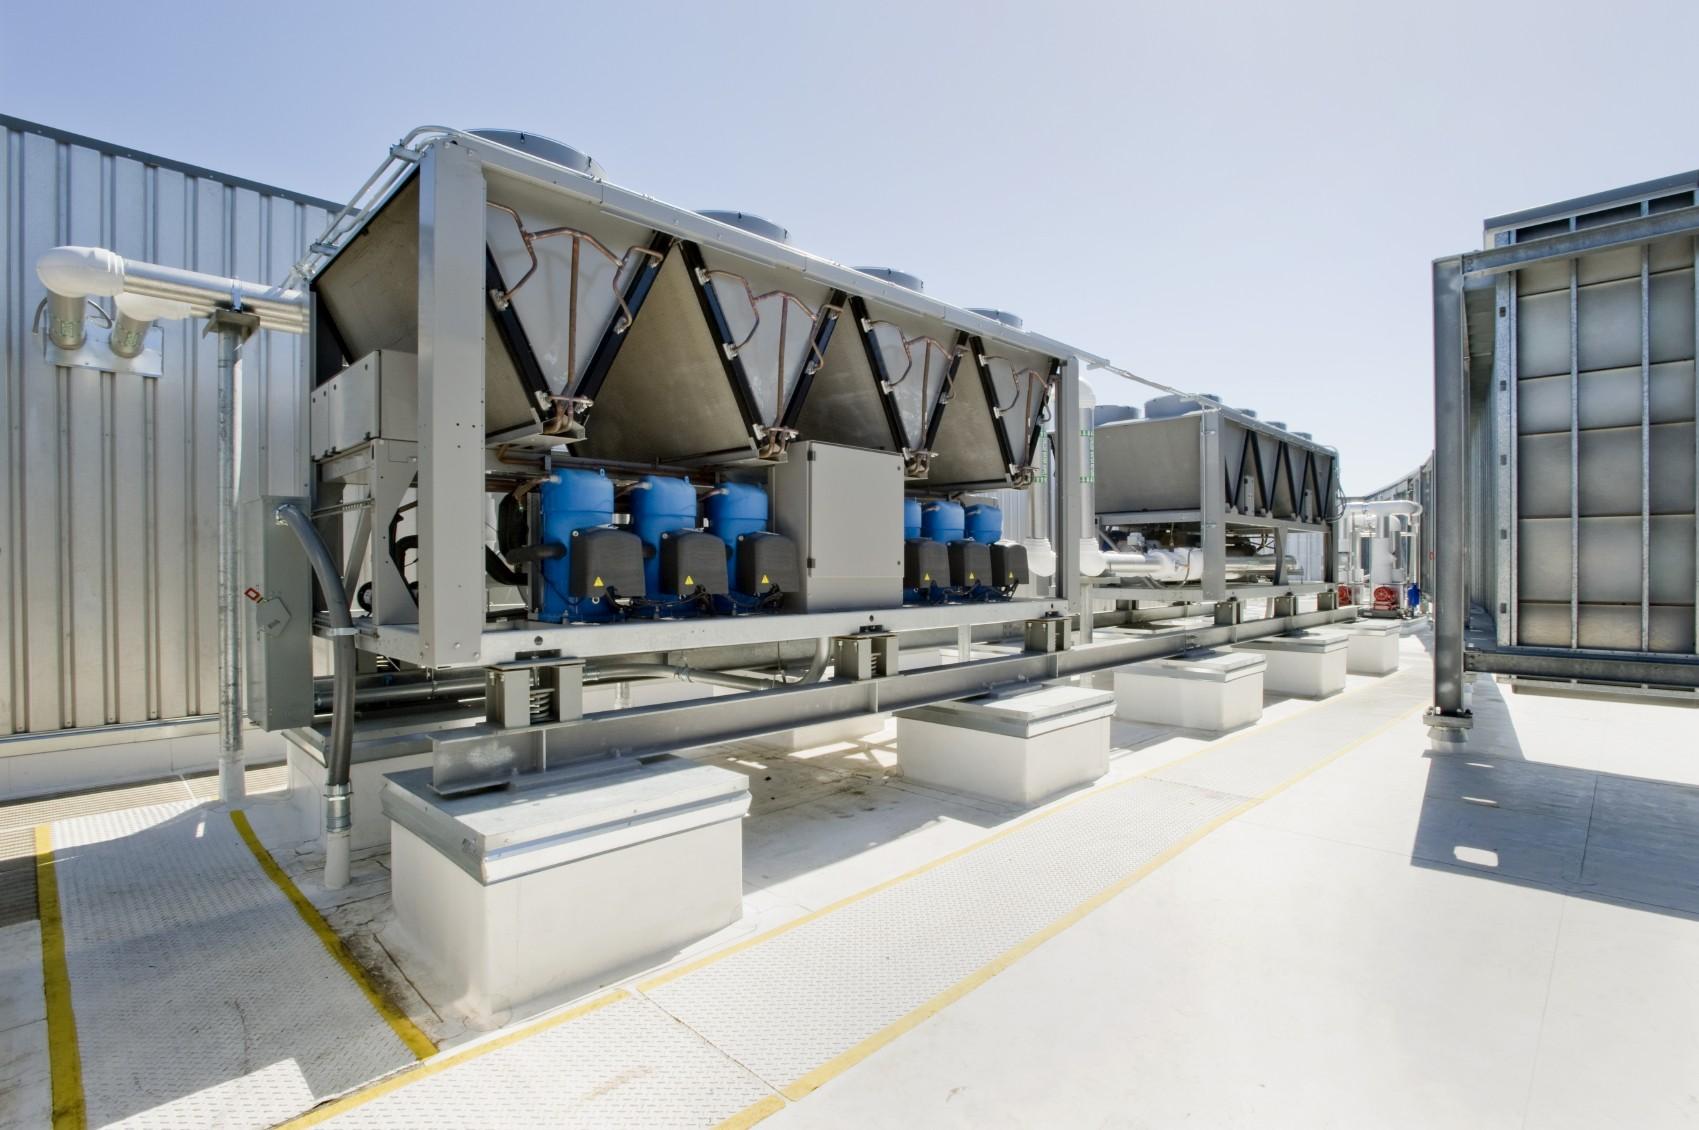 Os ar condicionados mais eficientes para hotéis para economizar na conta de energia